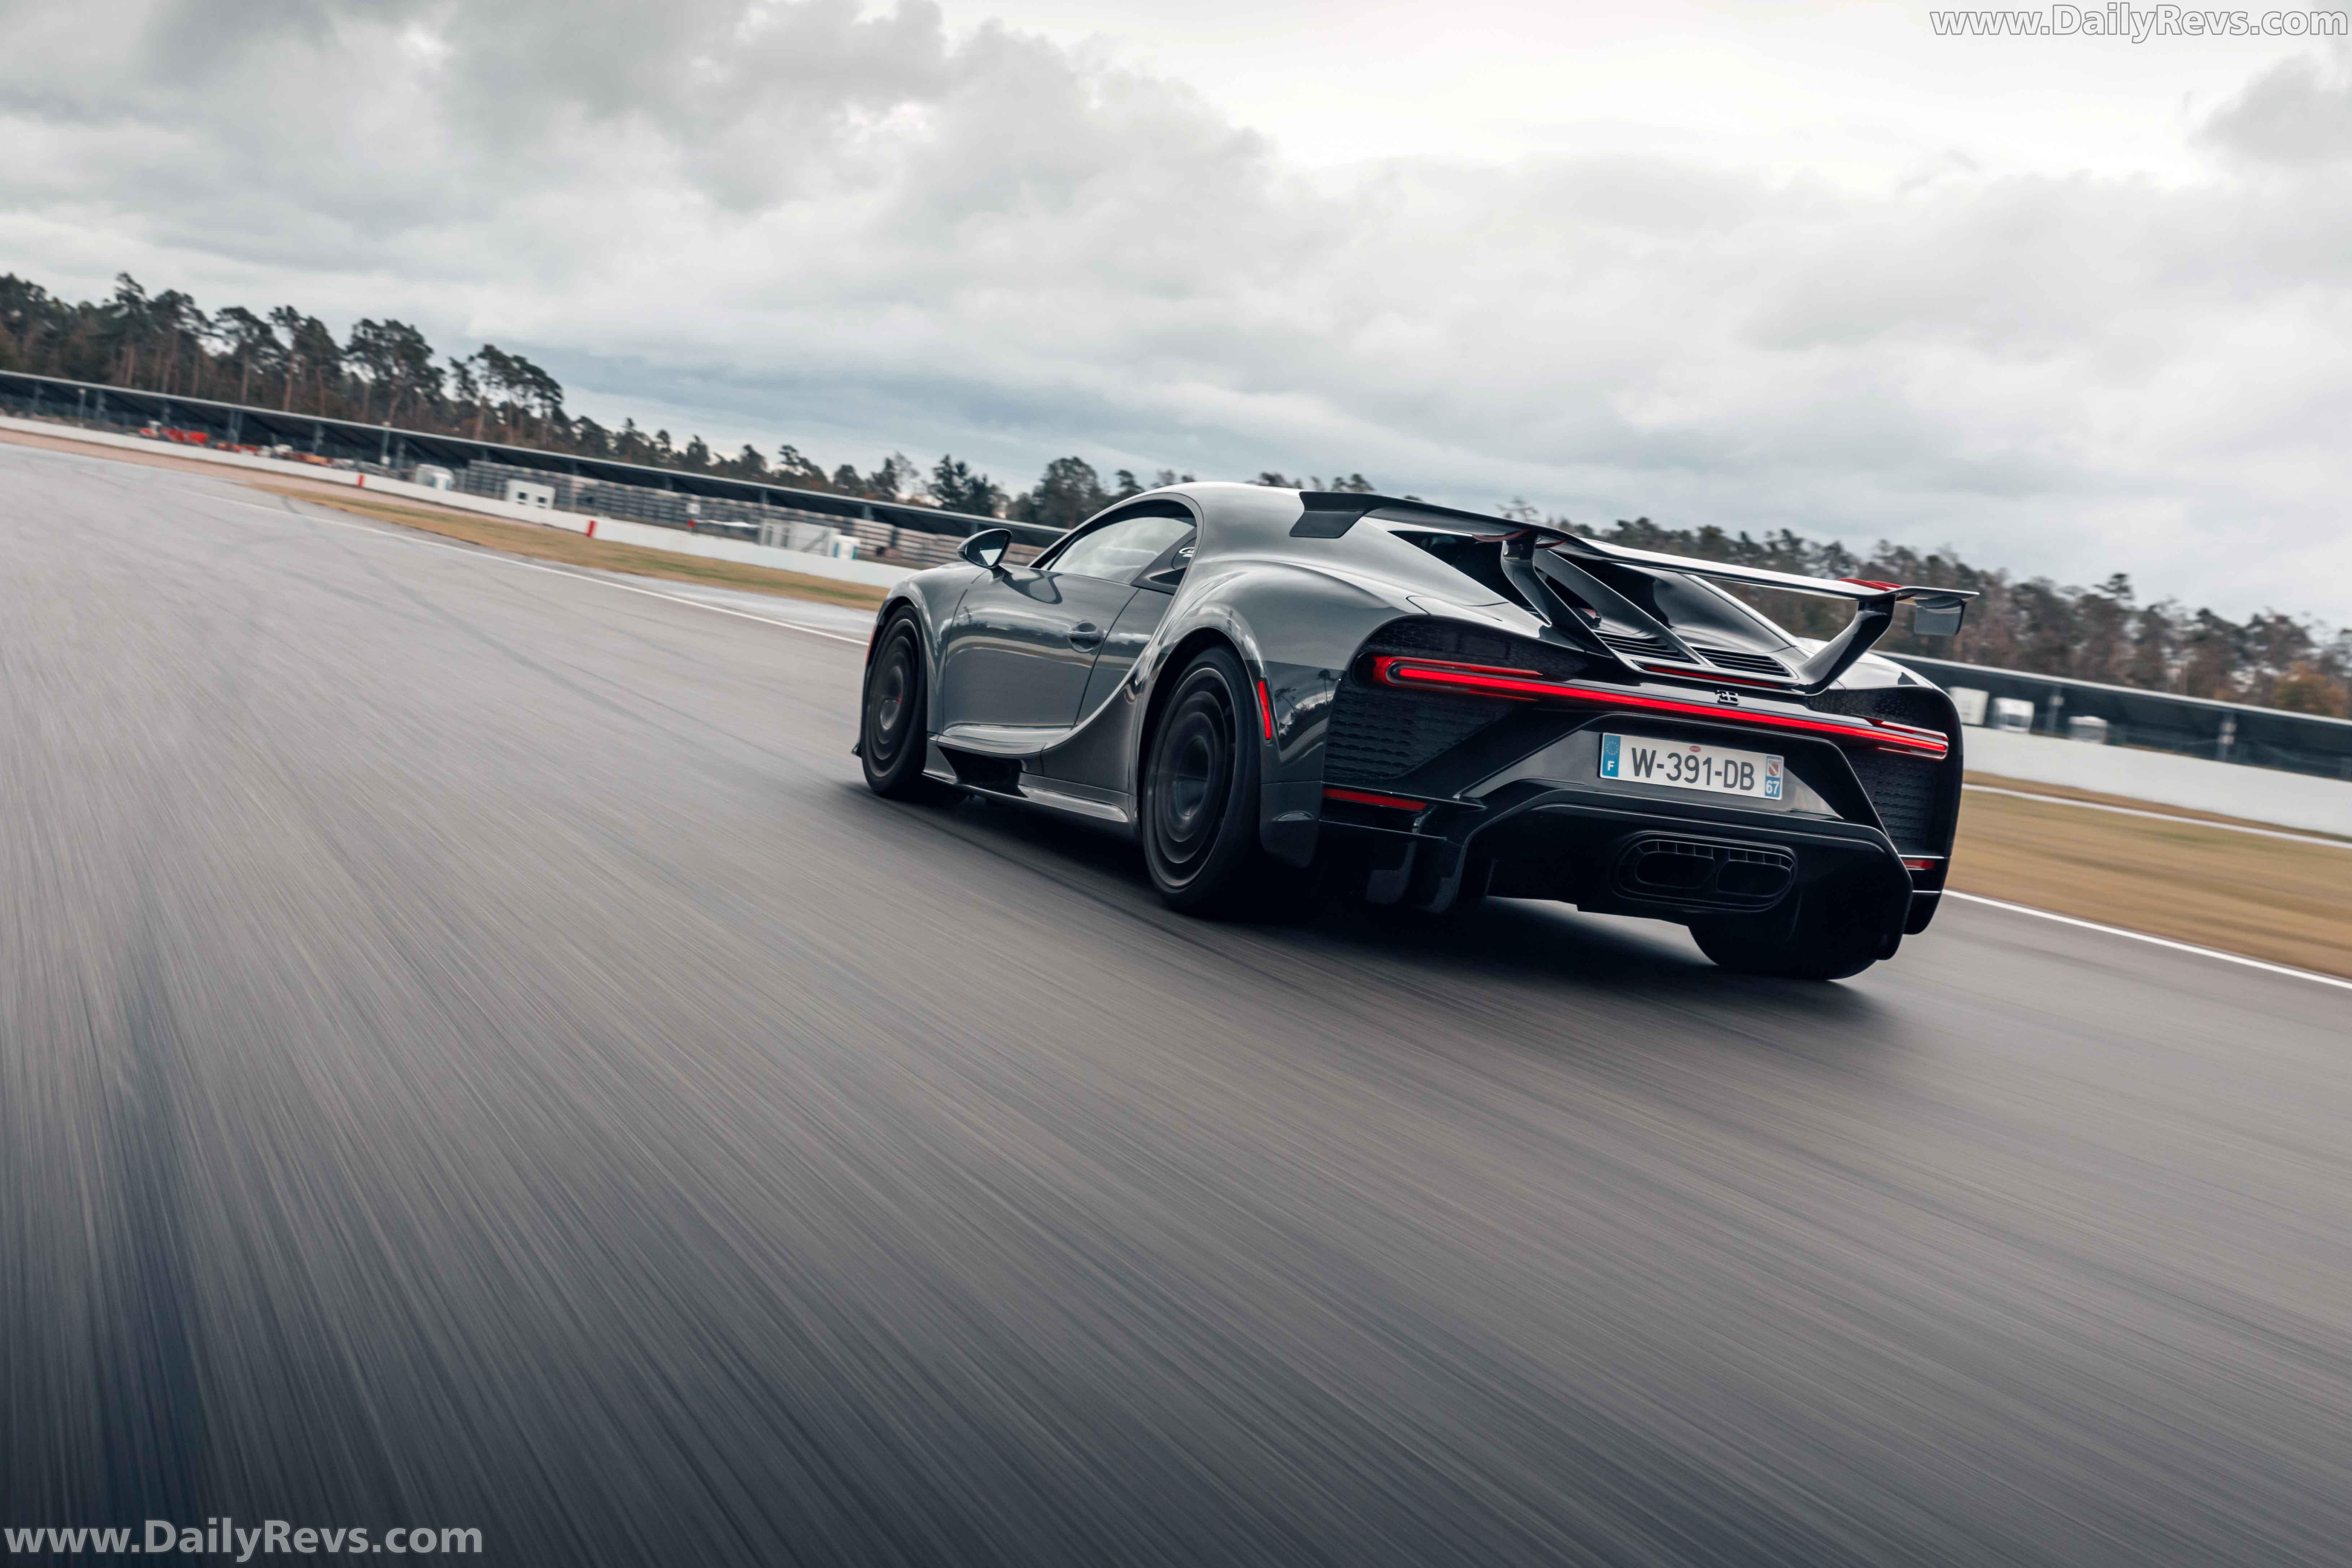 2021 Bugatti Chiron Pur Sport full